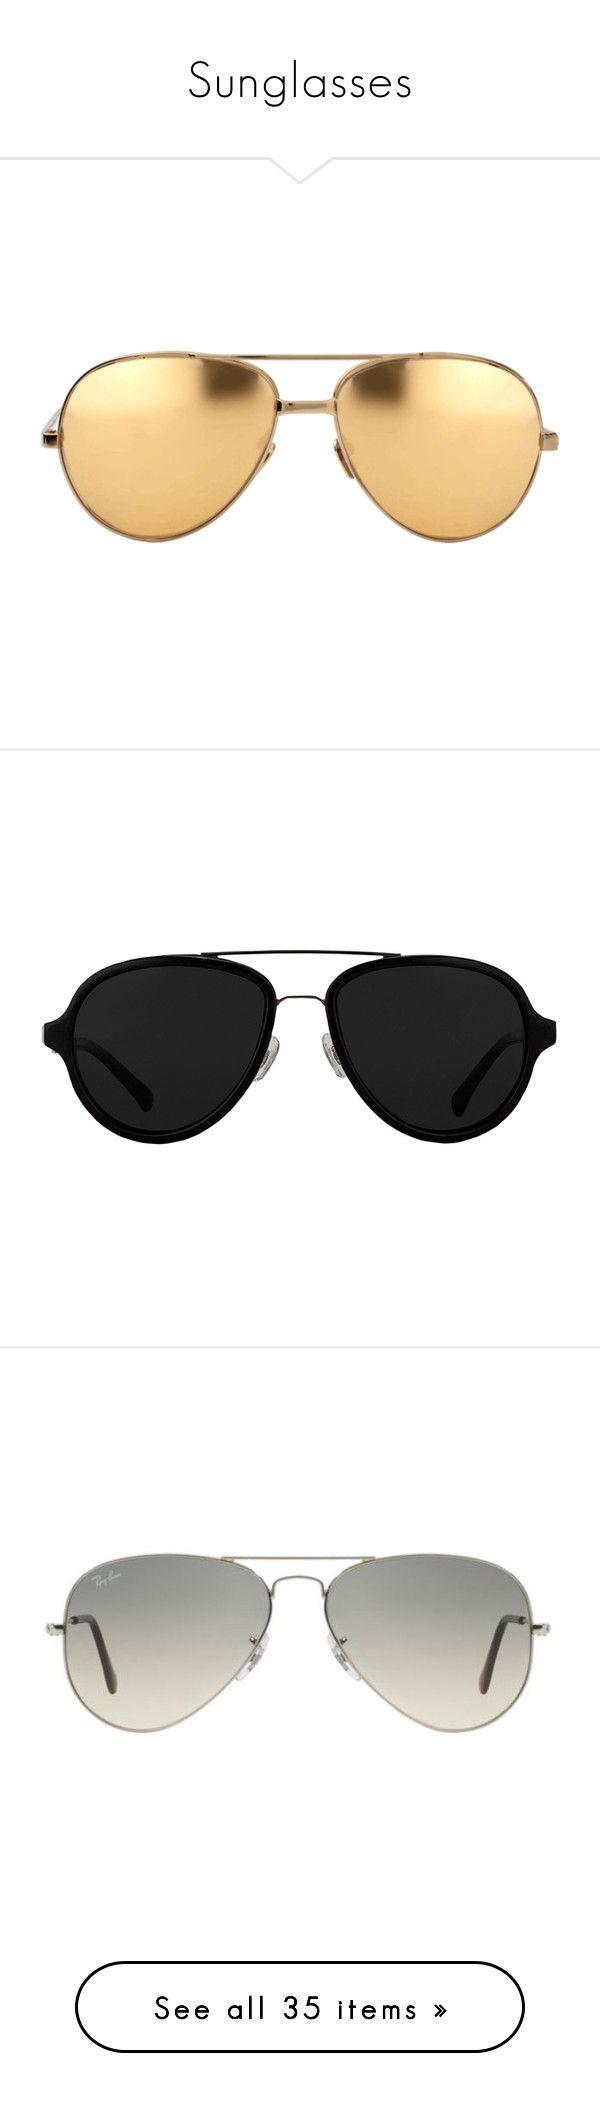 """Sunglasses"" by melissaobey ❤ liked on Polyvore featuring accessories, eyewear, sunglasses, glasses, extras, mirrored aviators, linda farrow sunglasses, gold aviators, gold aviator sunglasses and mirrored sunglasses"